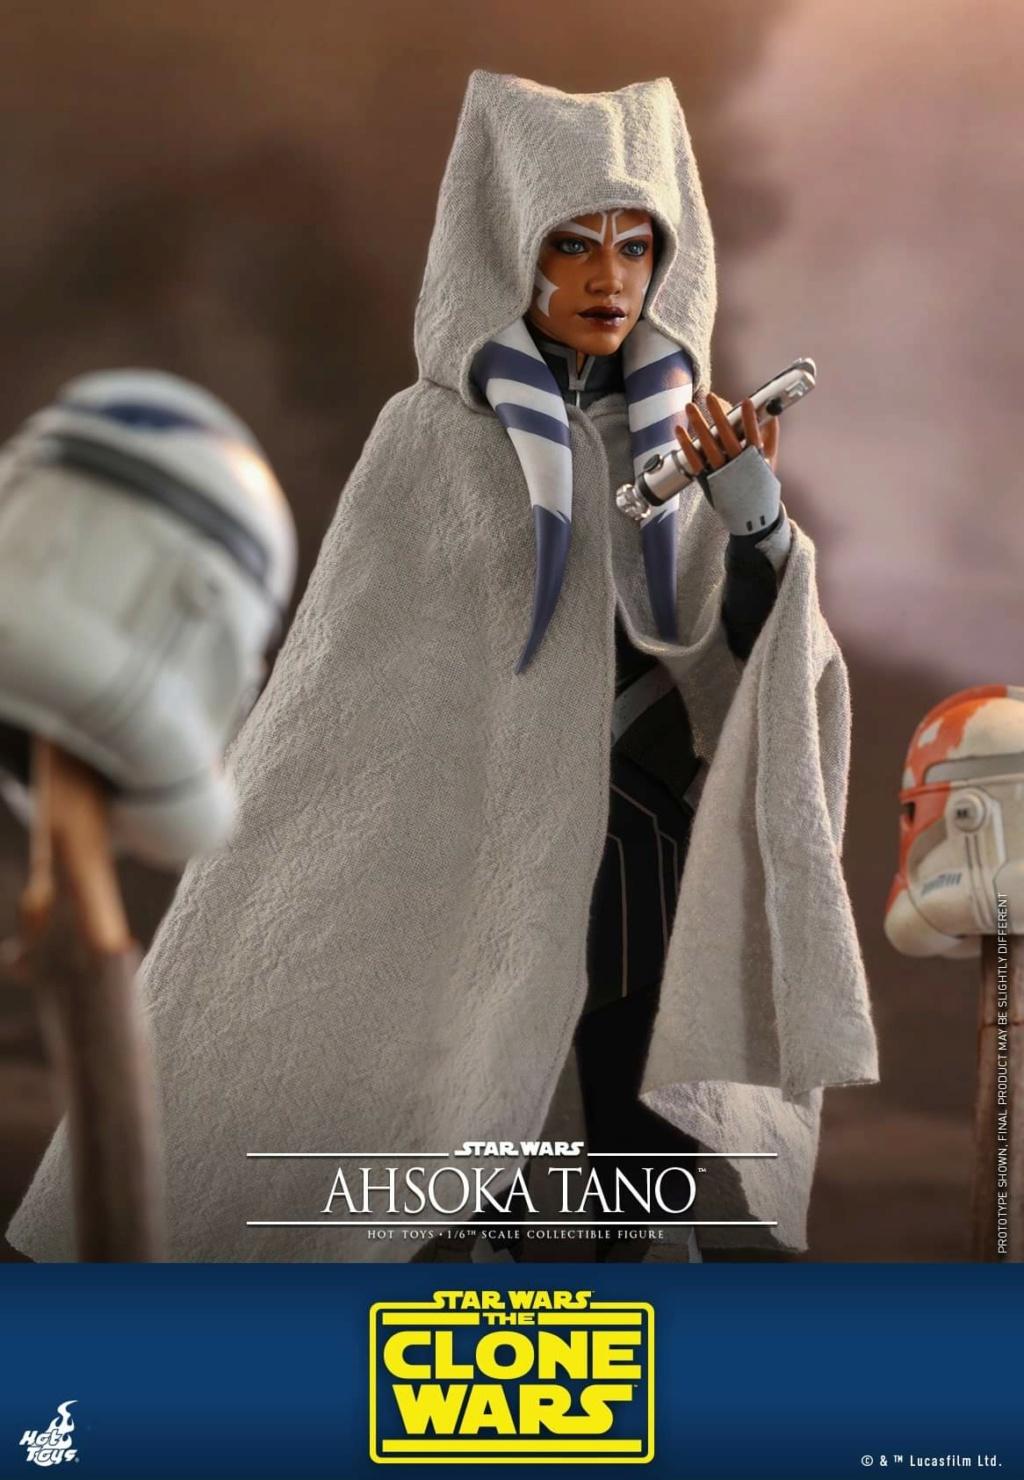 Ahsoka Tano - 1/6th scale - The Clone Wars - Hot Toys Fb_im132